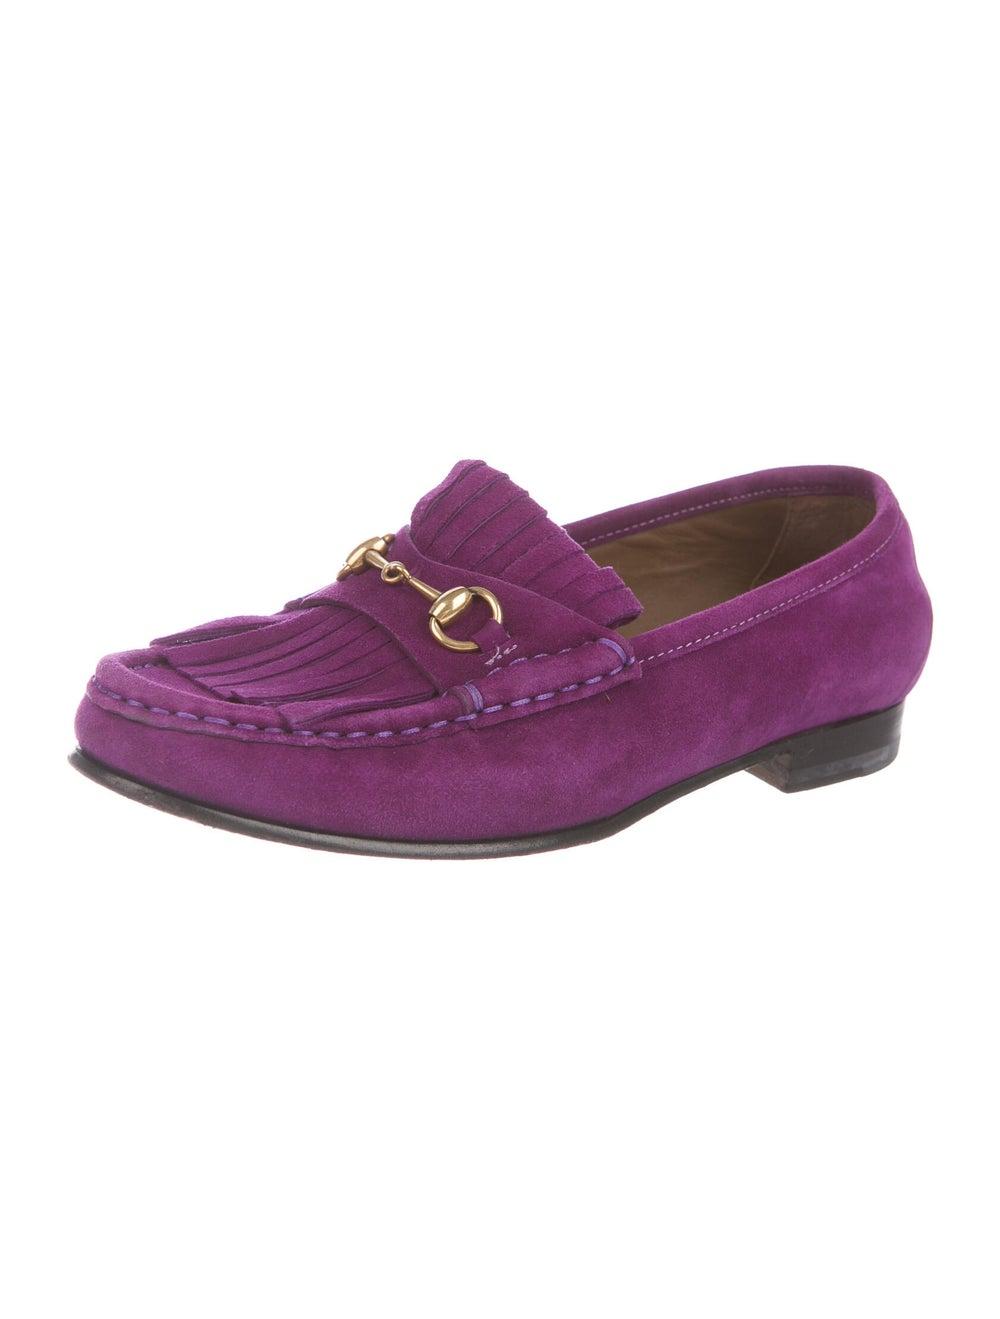 Gucci Horsebit Accent Suede Loafers Purple - image 2